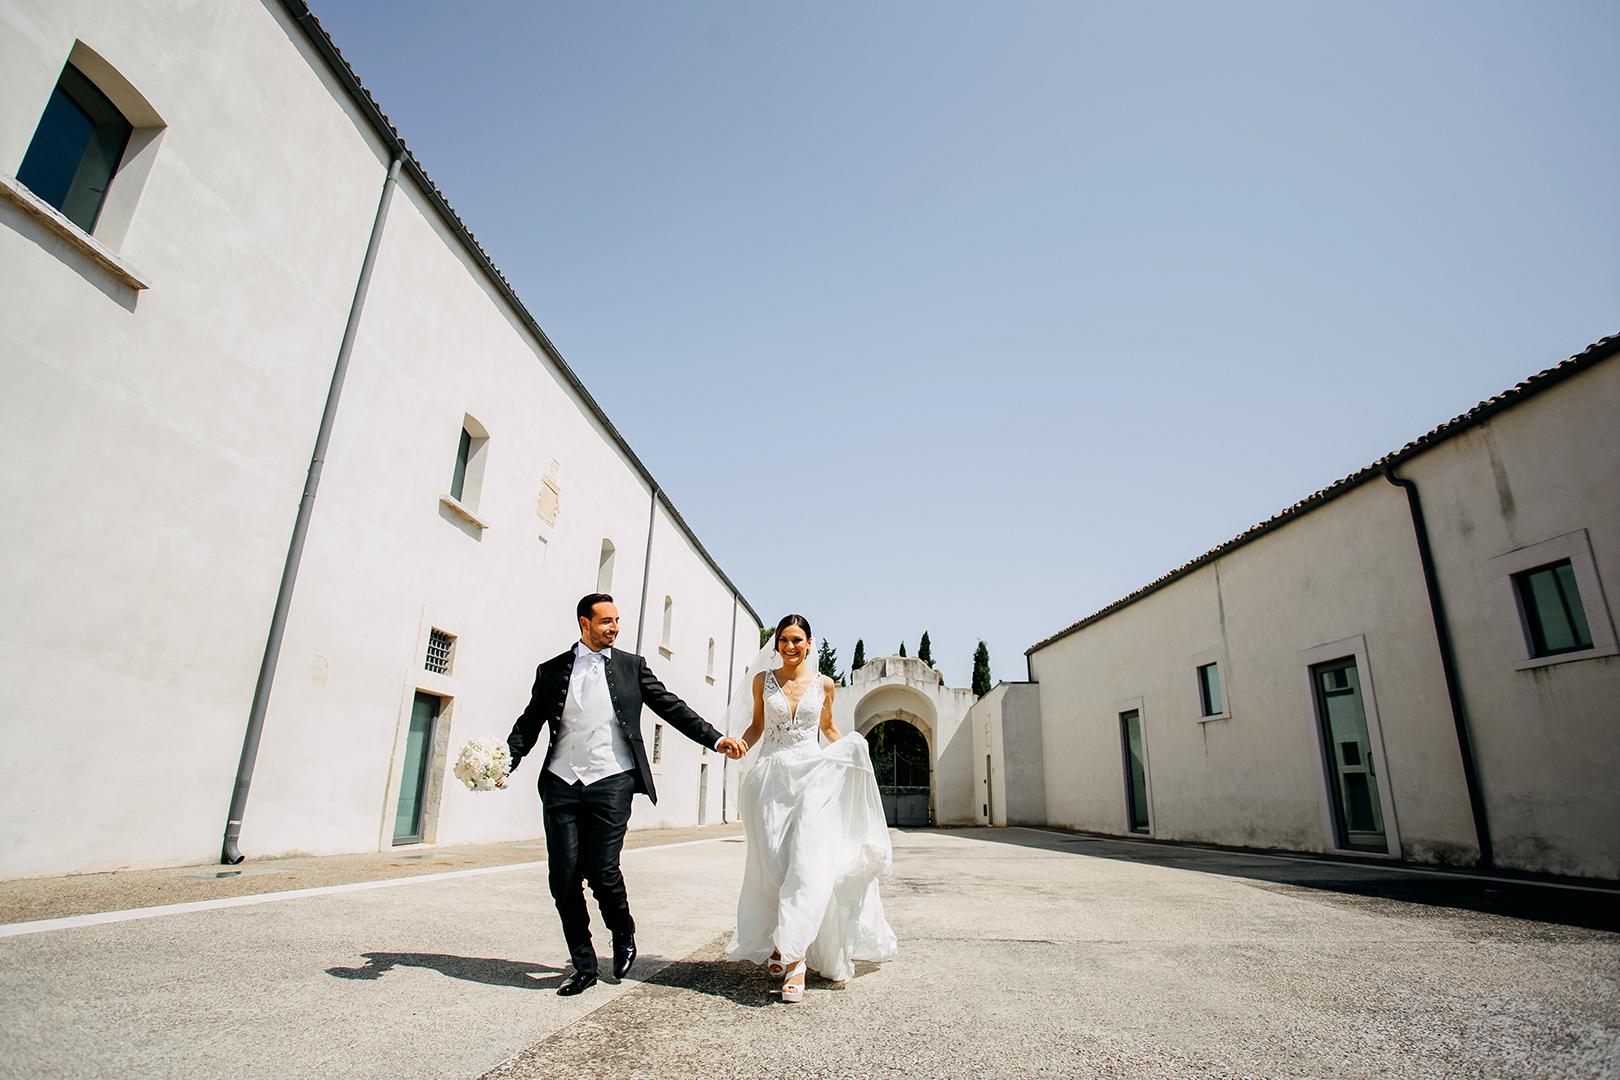 31 gianni-lepore-matrimonio-stornarella